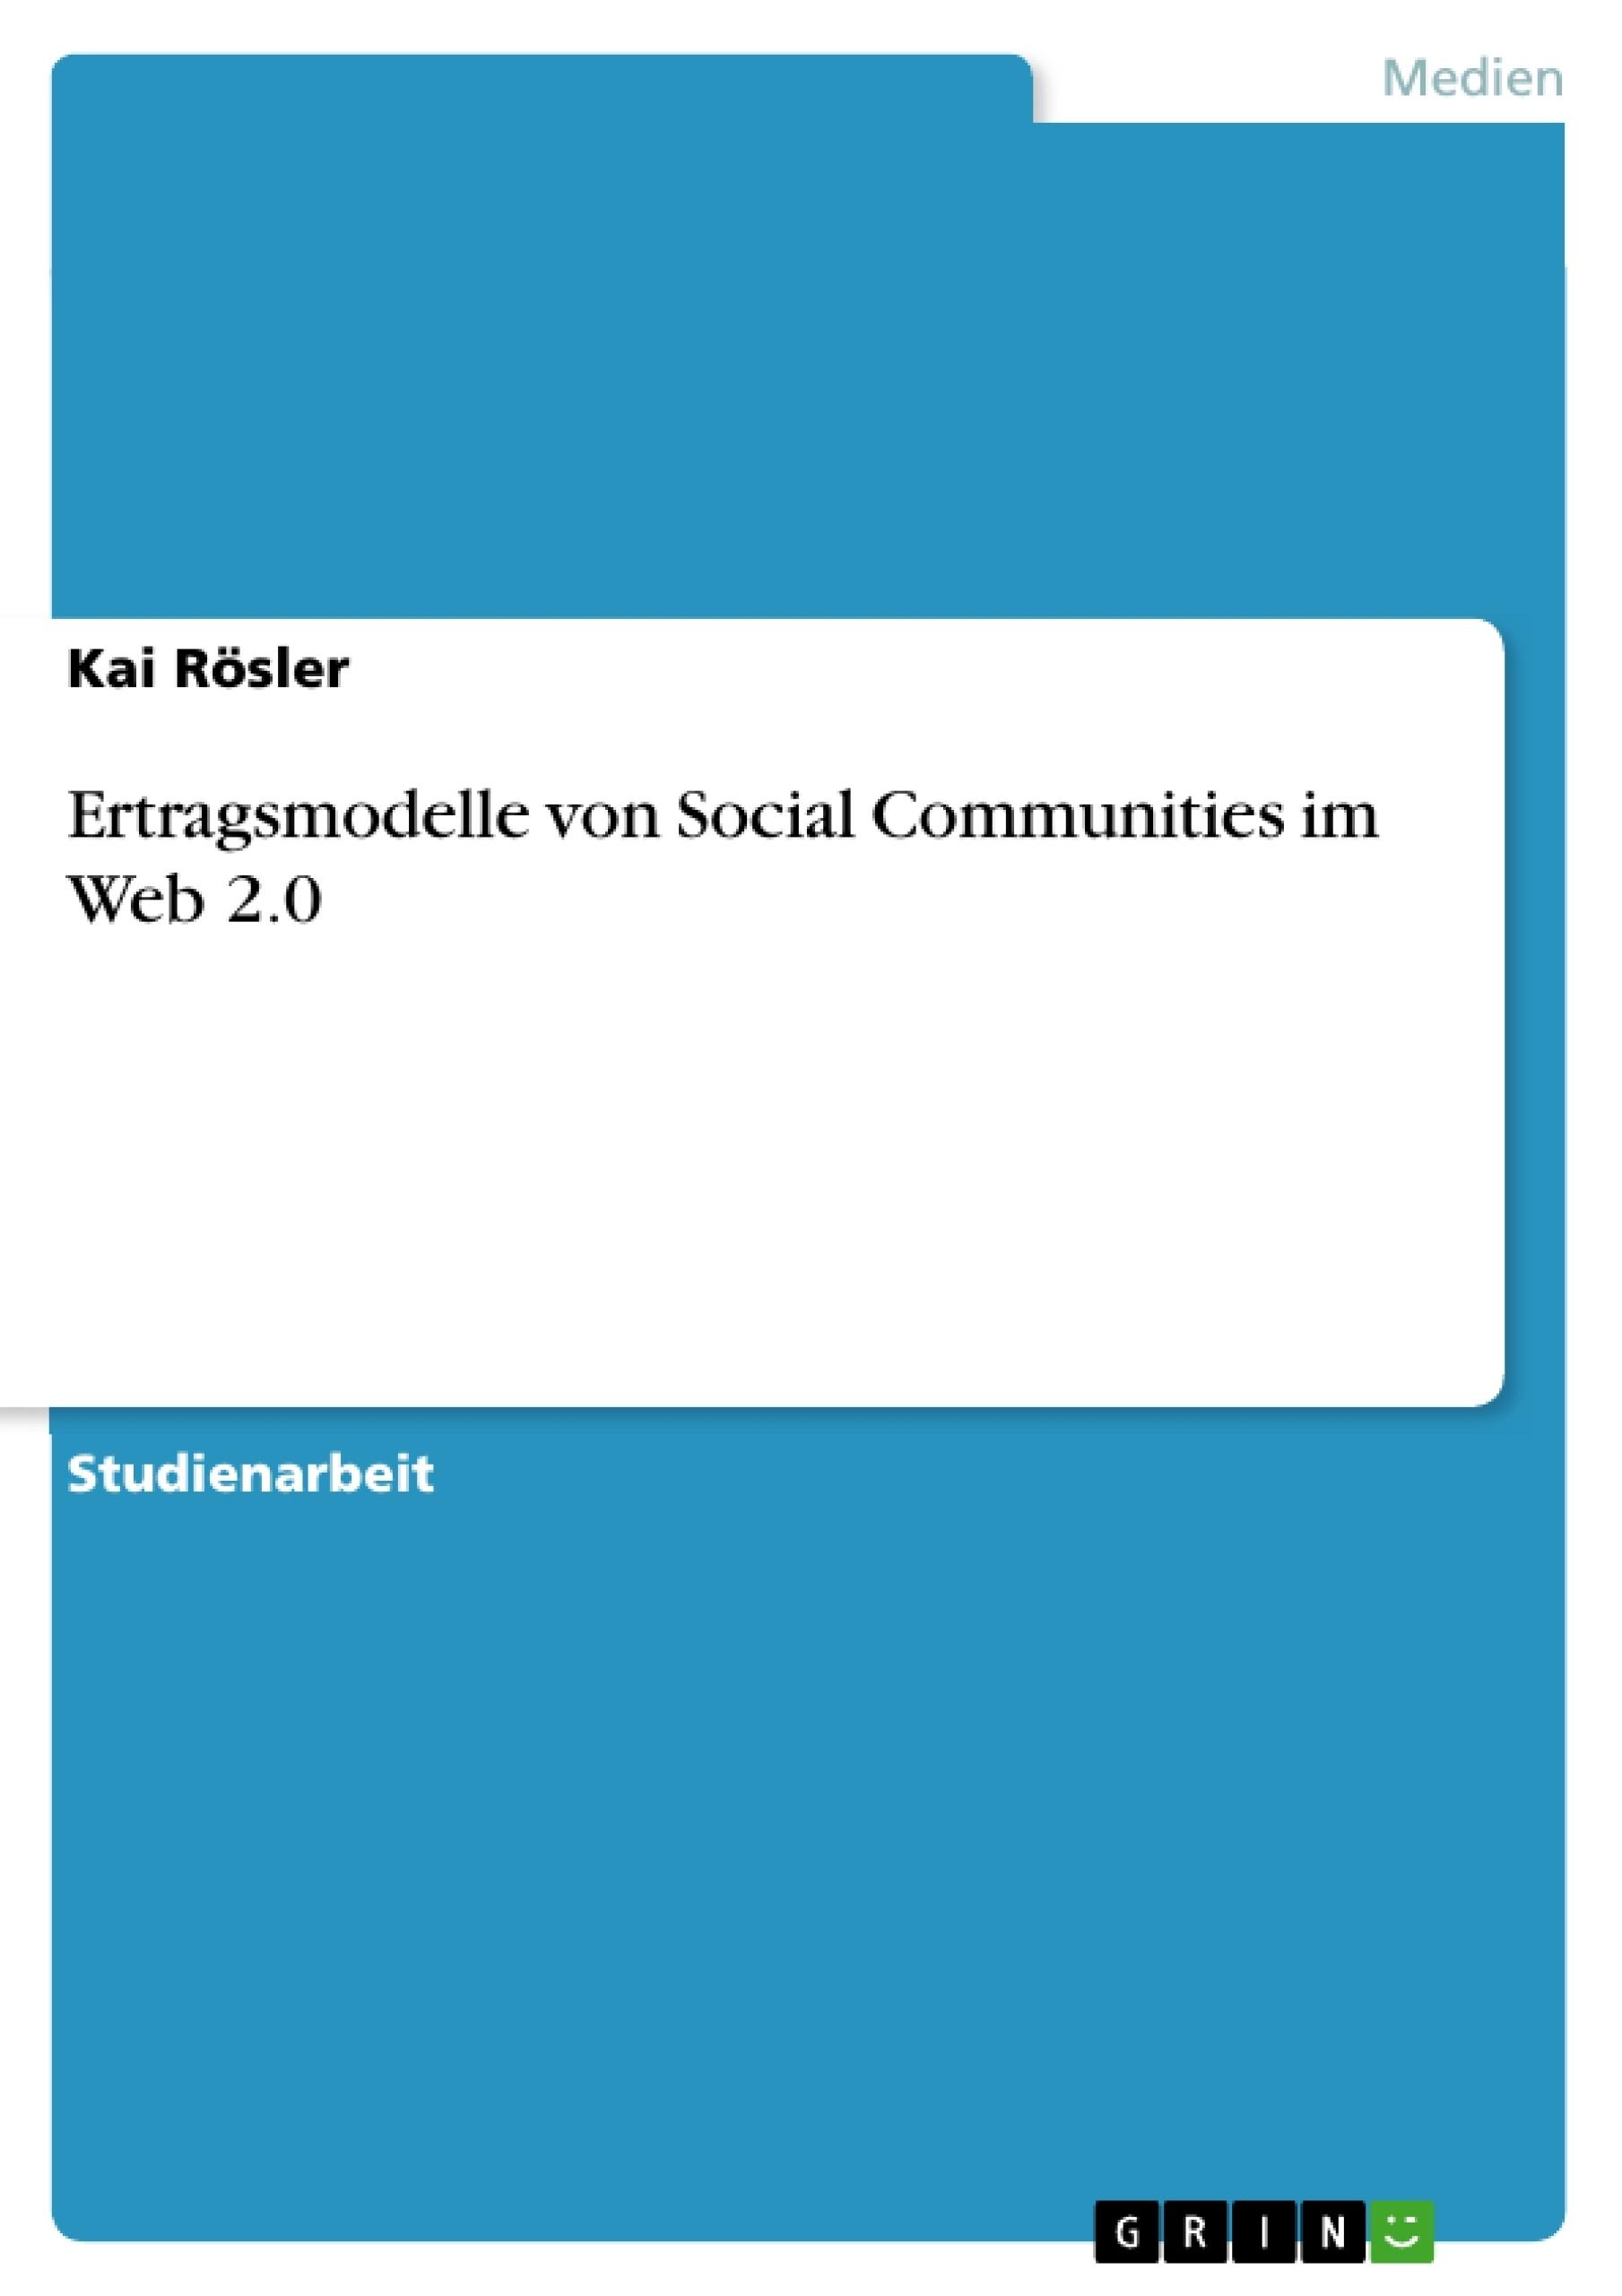 Titel: Ertragsmodelle von Social Communities im Web 2.0